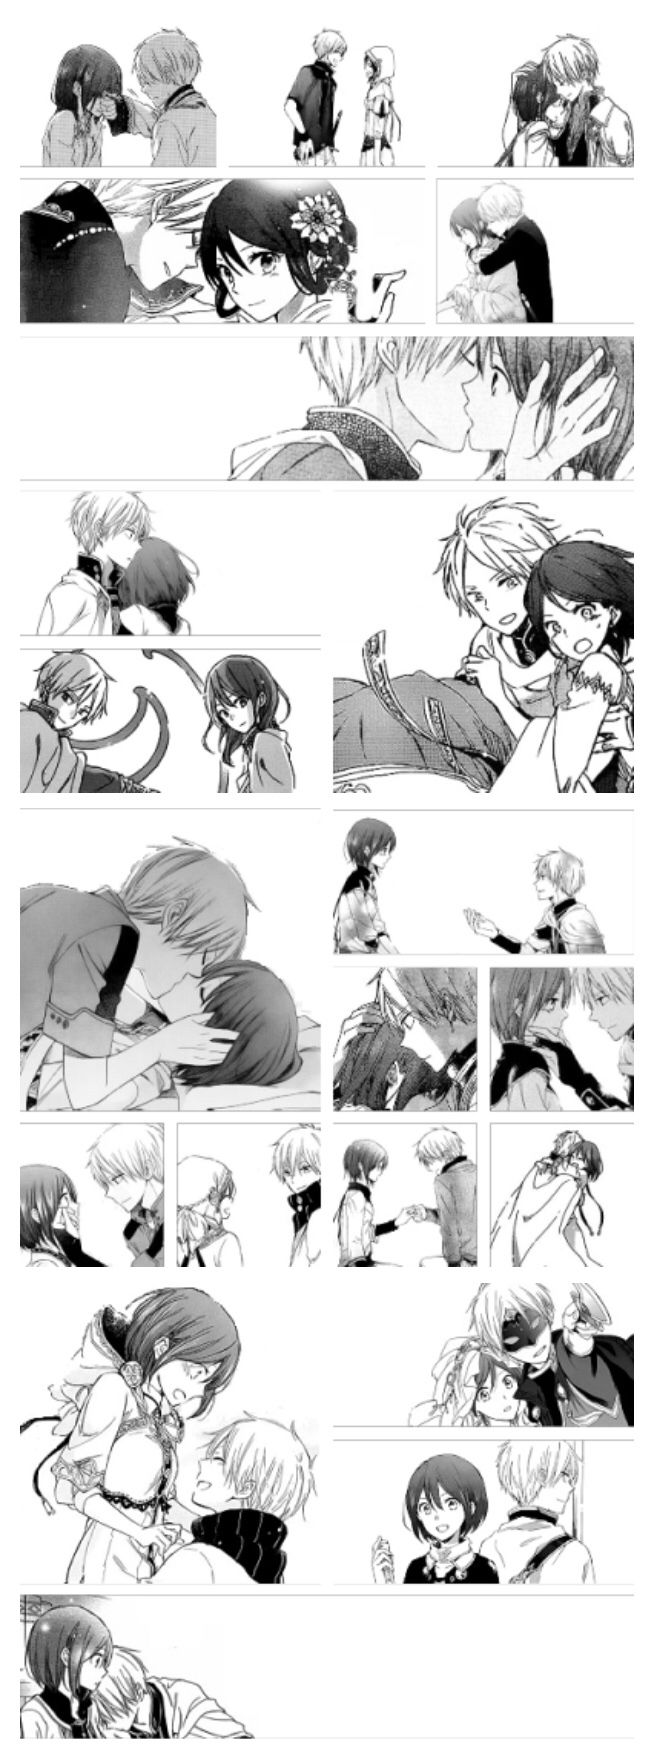 Akagami no Shirayukihime, Manga, Shirayuki, Zen Wistalia I LOVE THIS MANGA!!